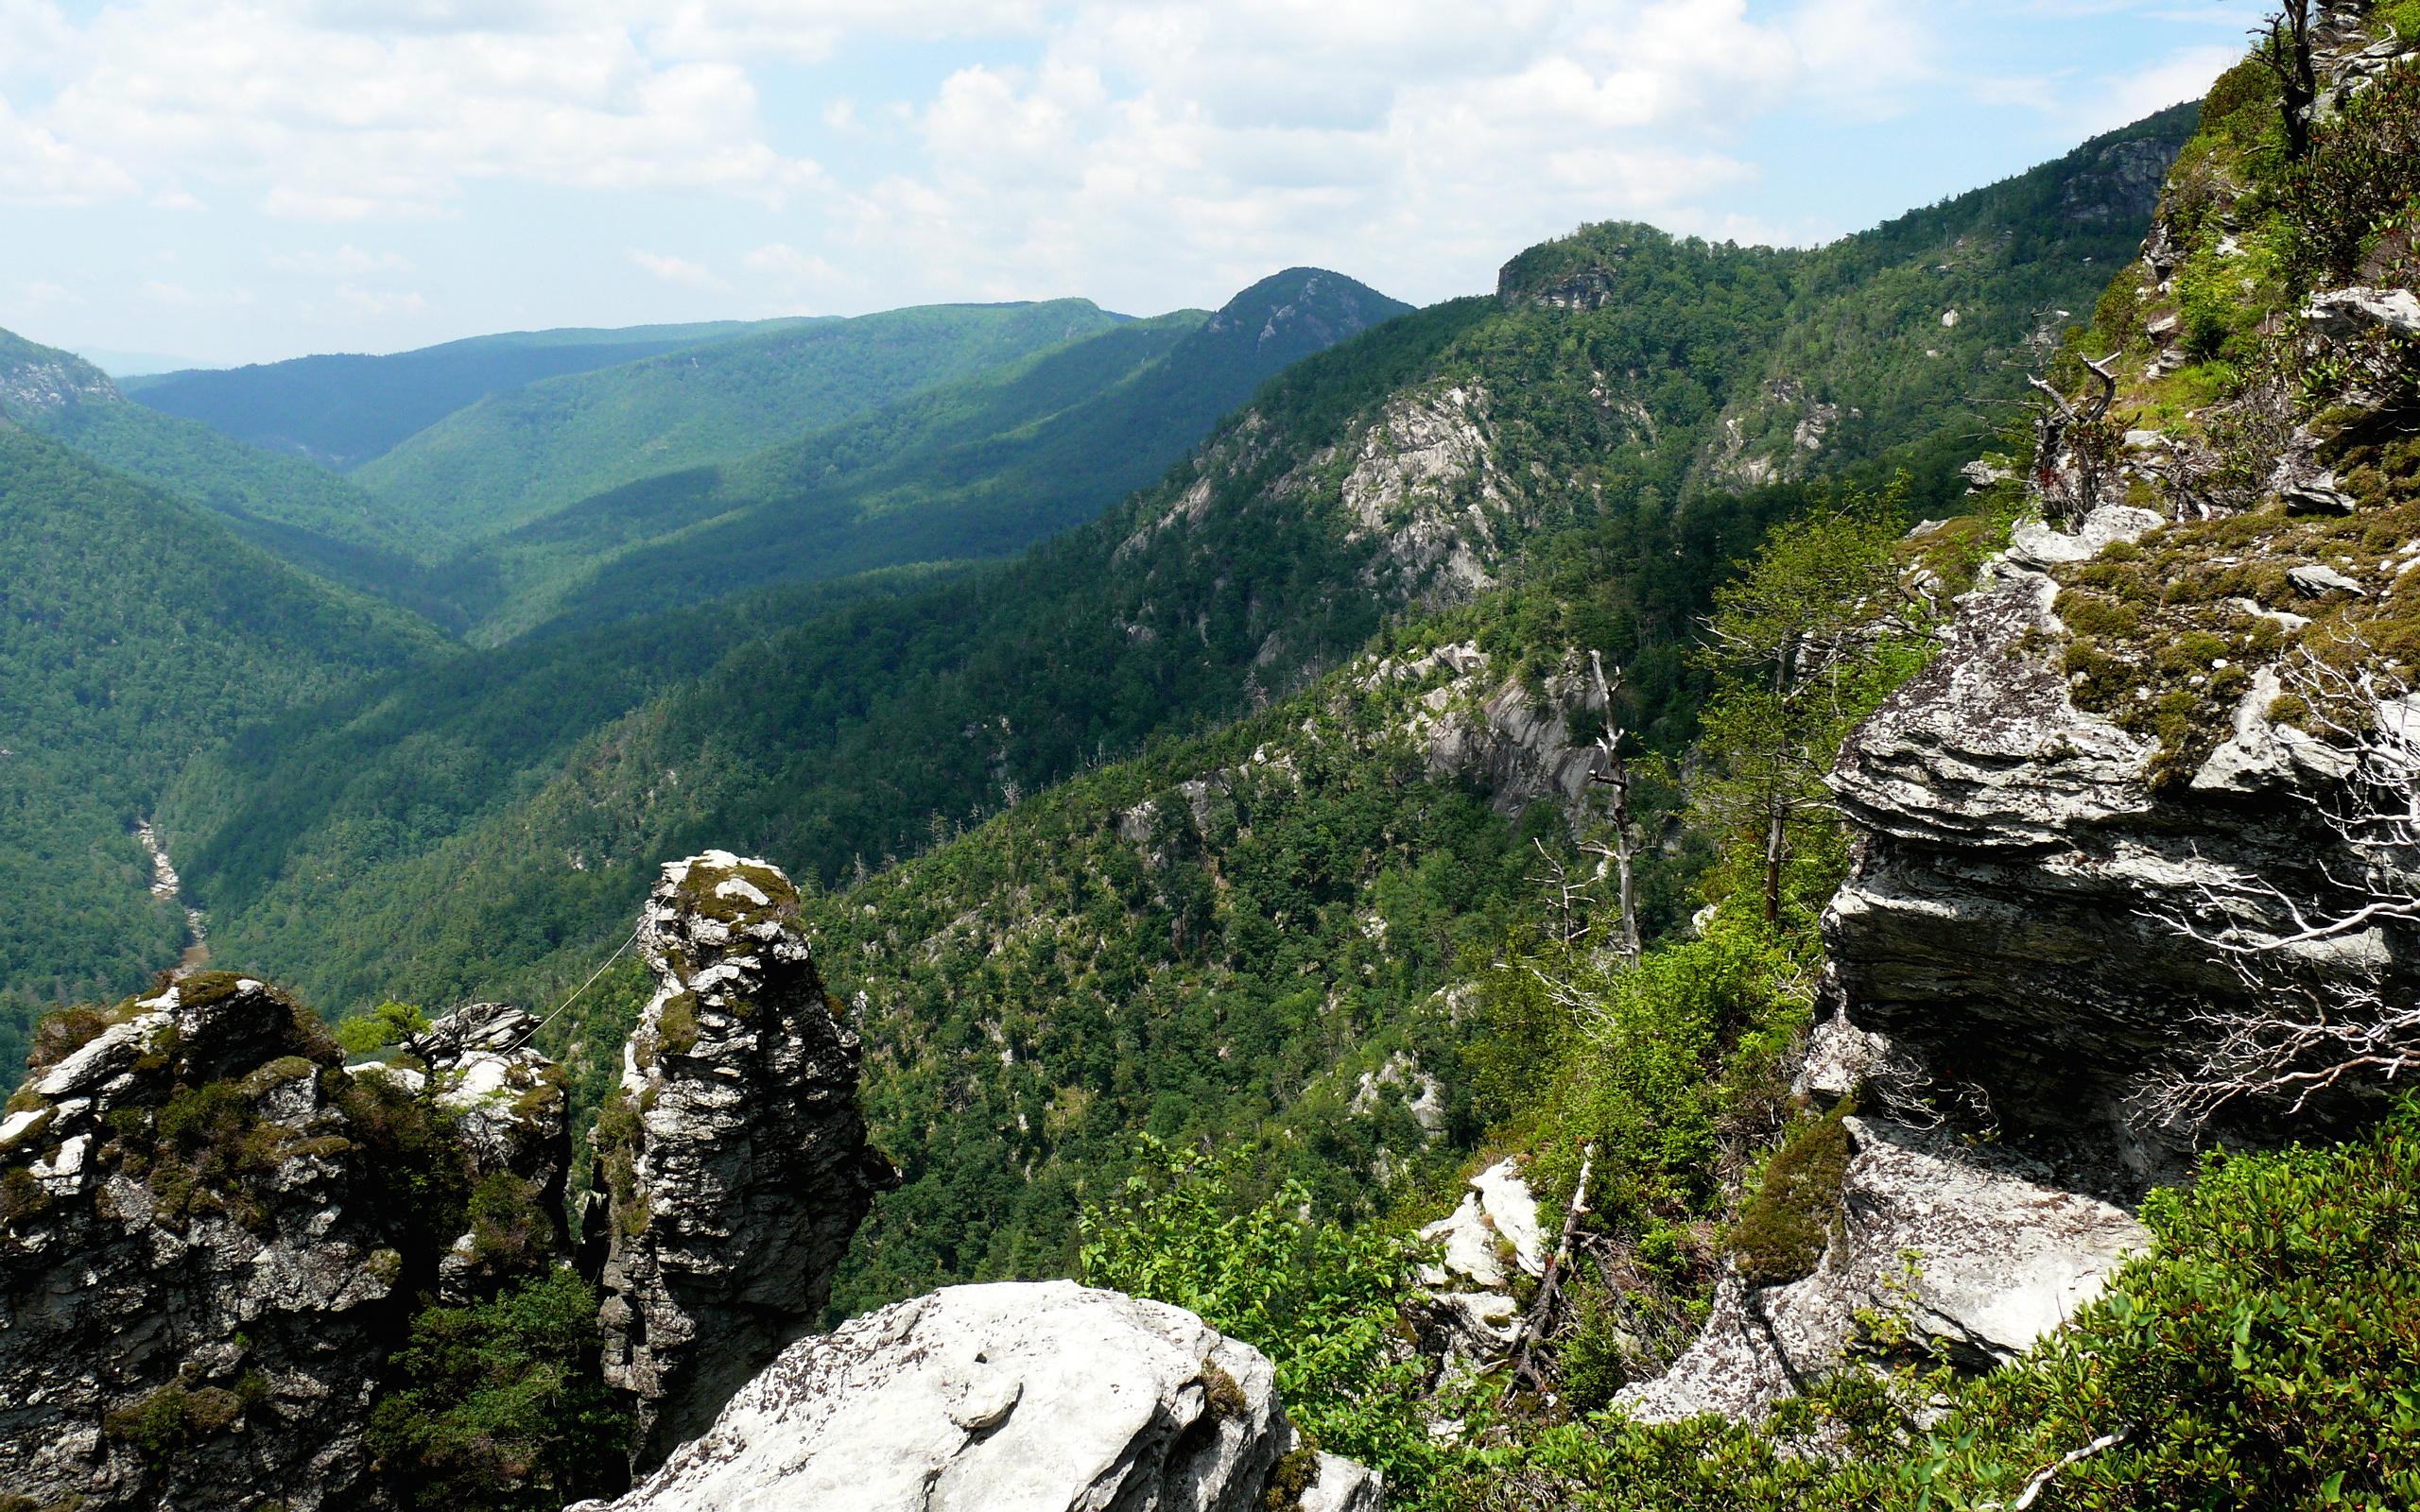 8 Tage auf dem legendärem Appalachian Trail (USA)